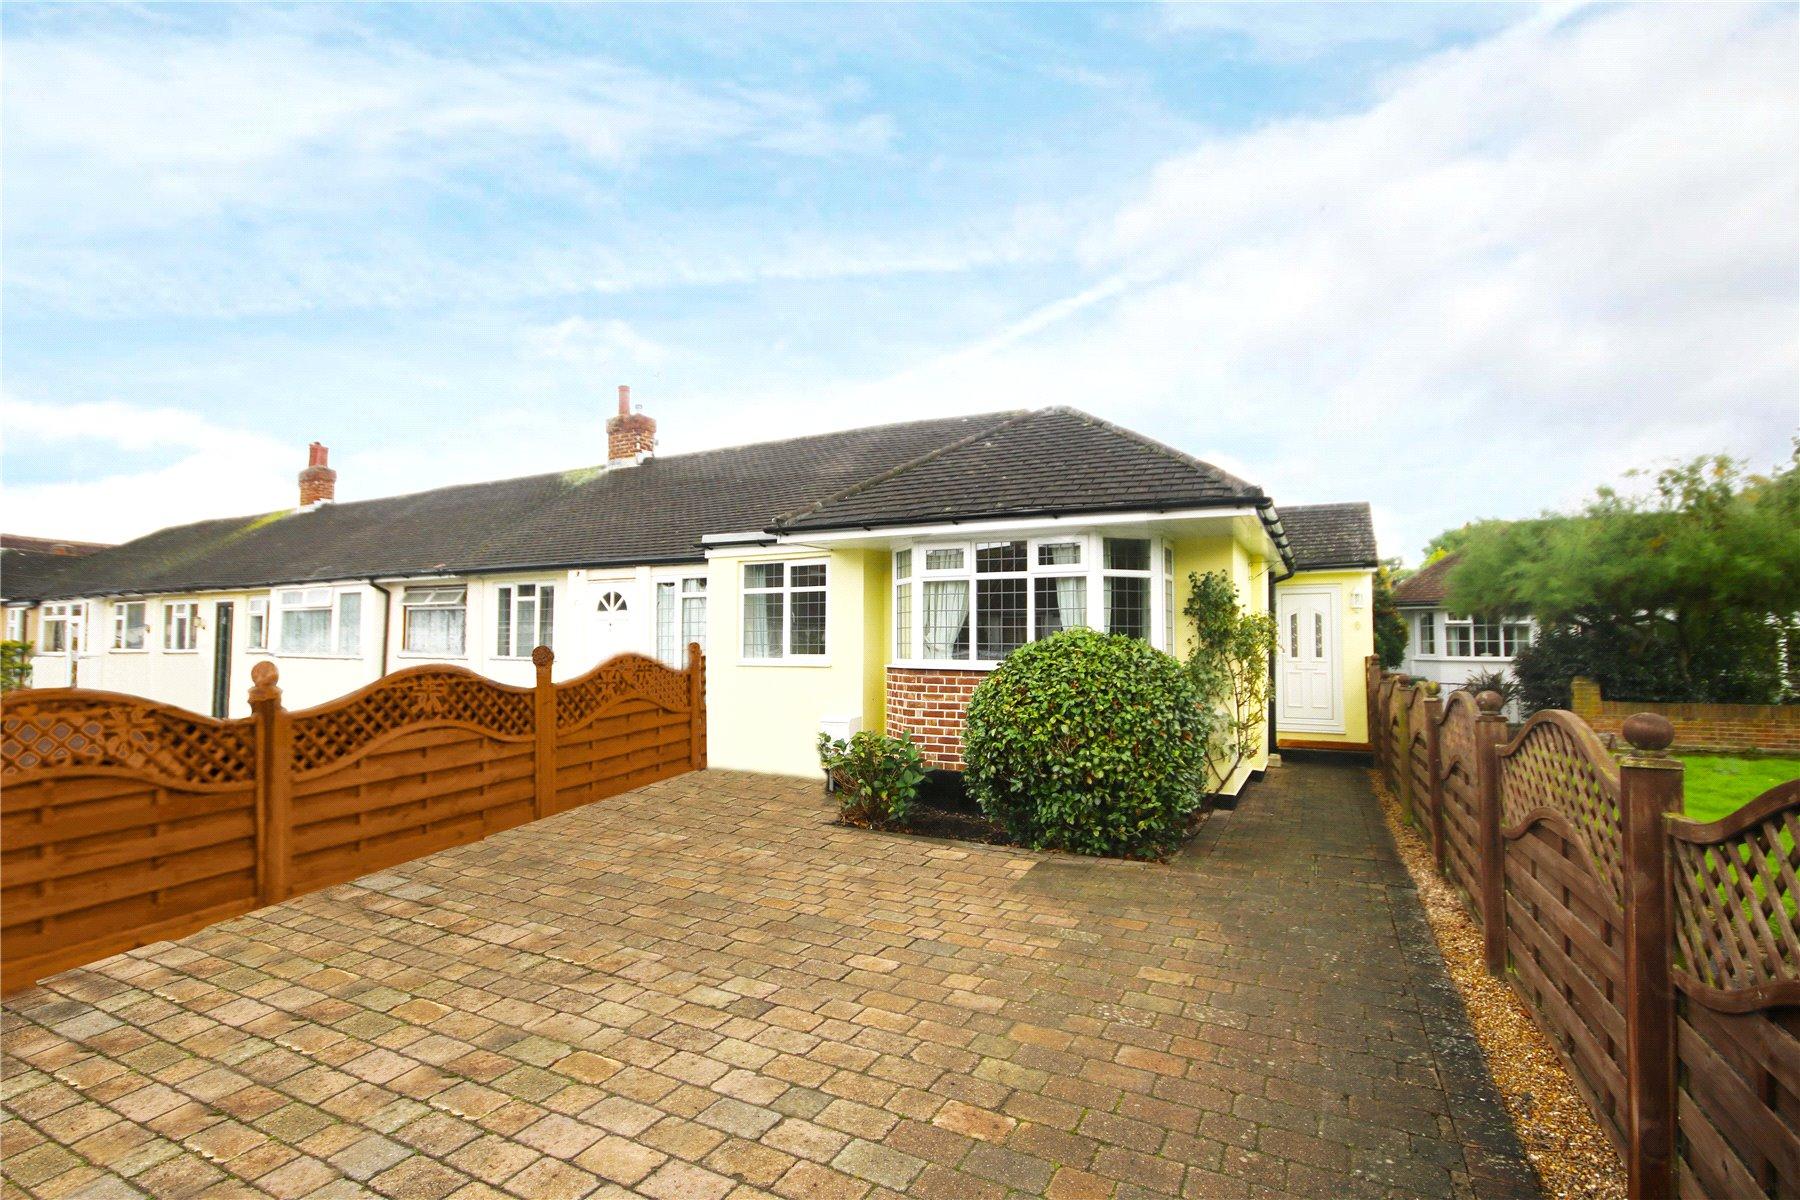 2 Bedrooms Bungalow for sale in Bramley Close, Chertsey, Surrey, KT16